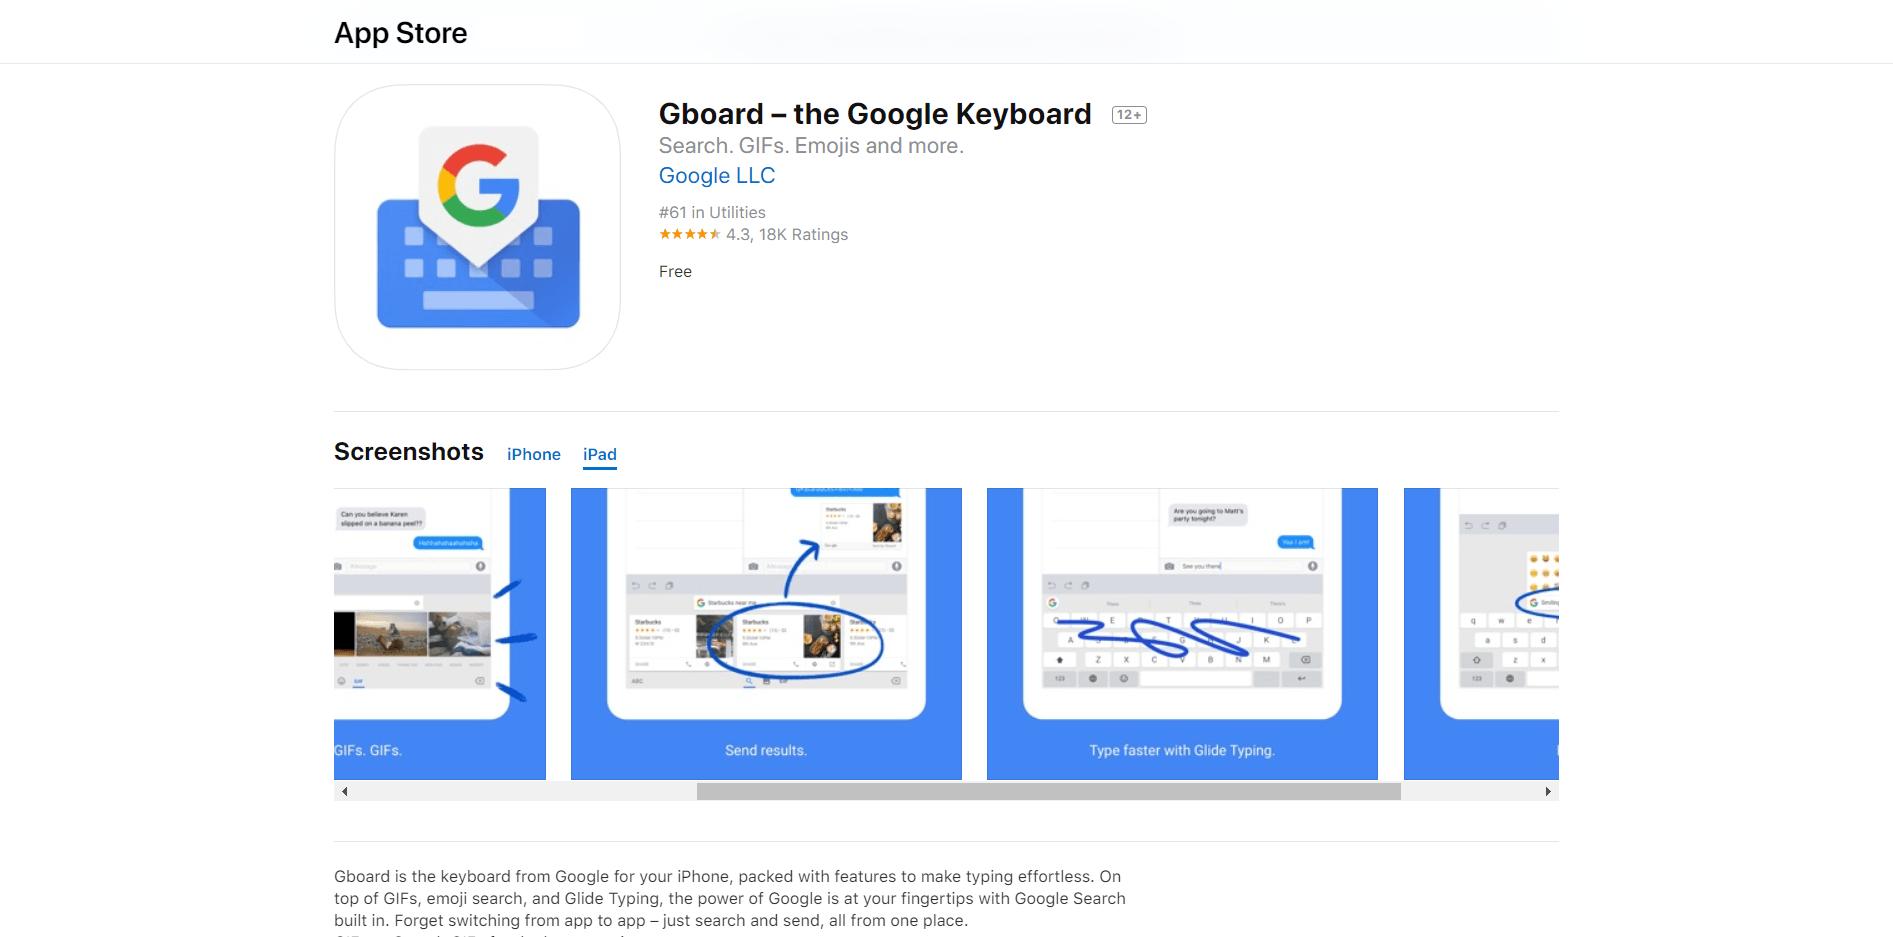 Gboard Google Keyboard for iPad